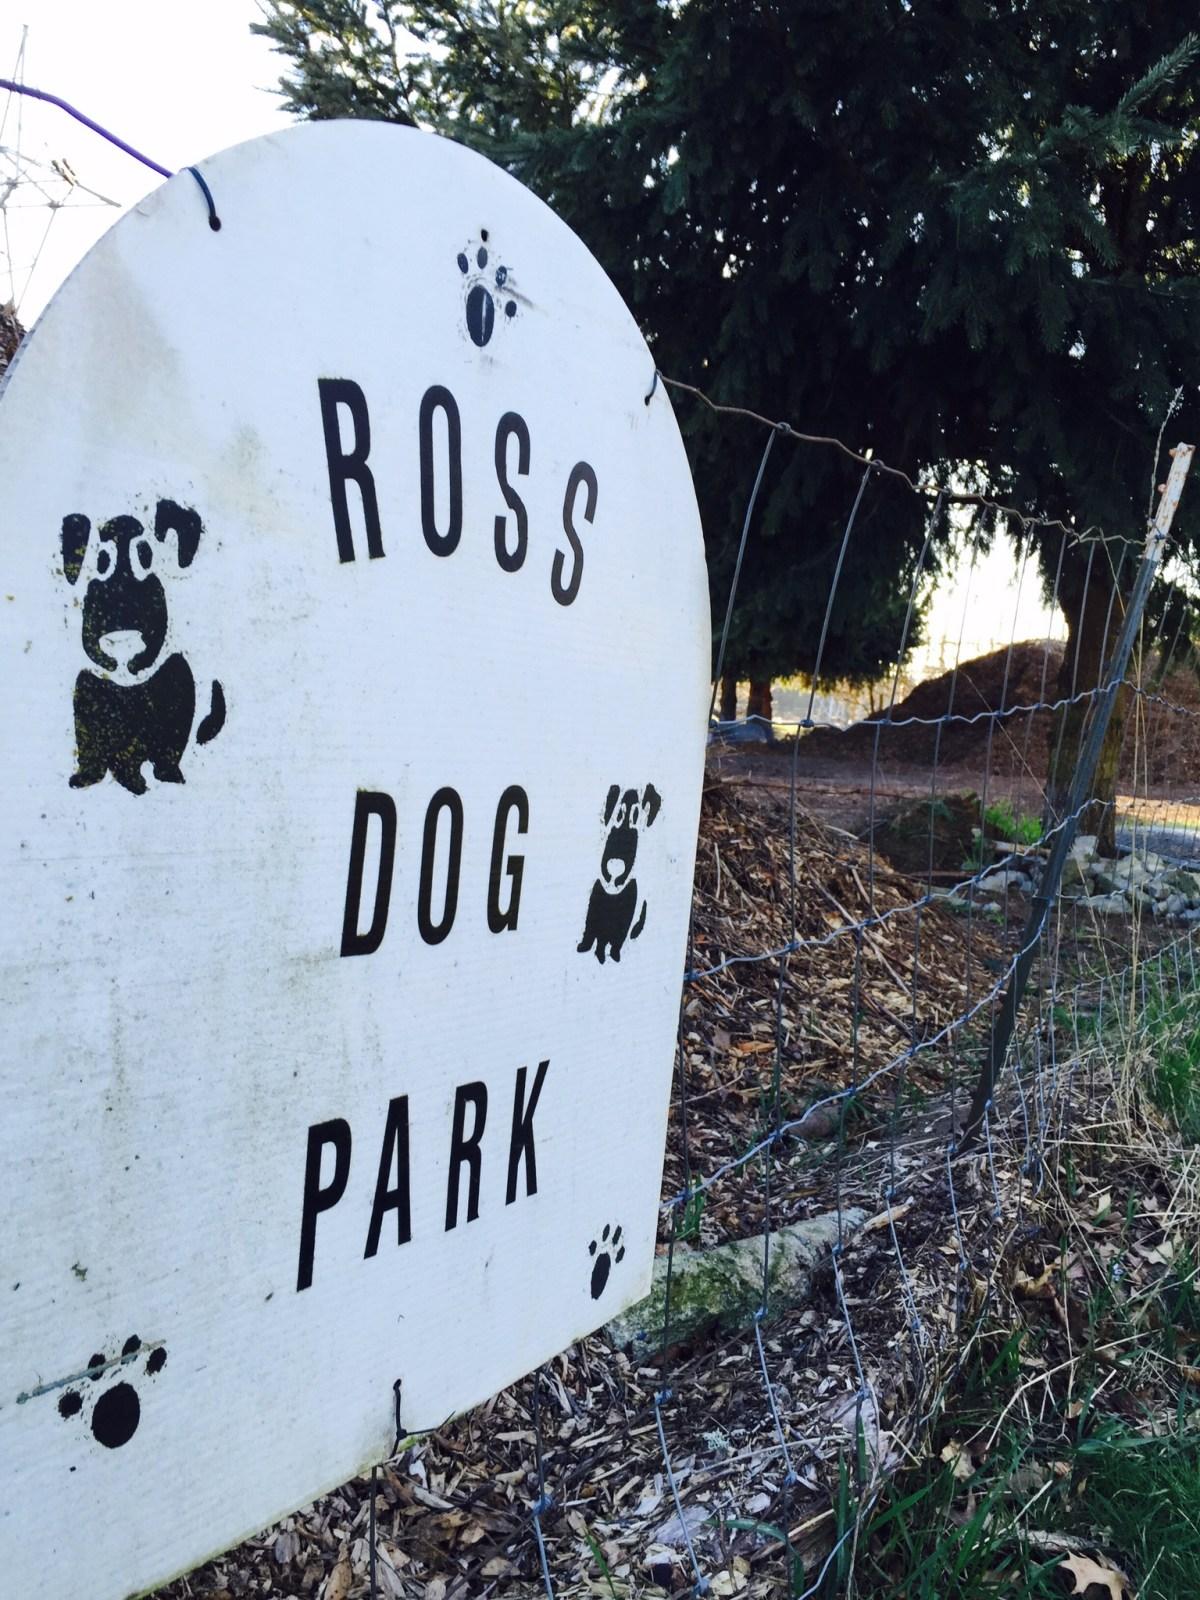 Sign for Ross Dog park.